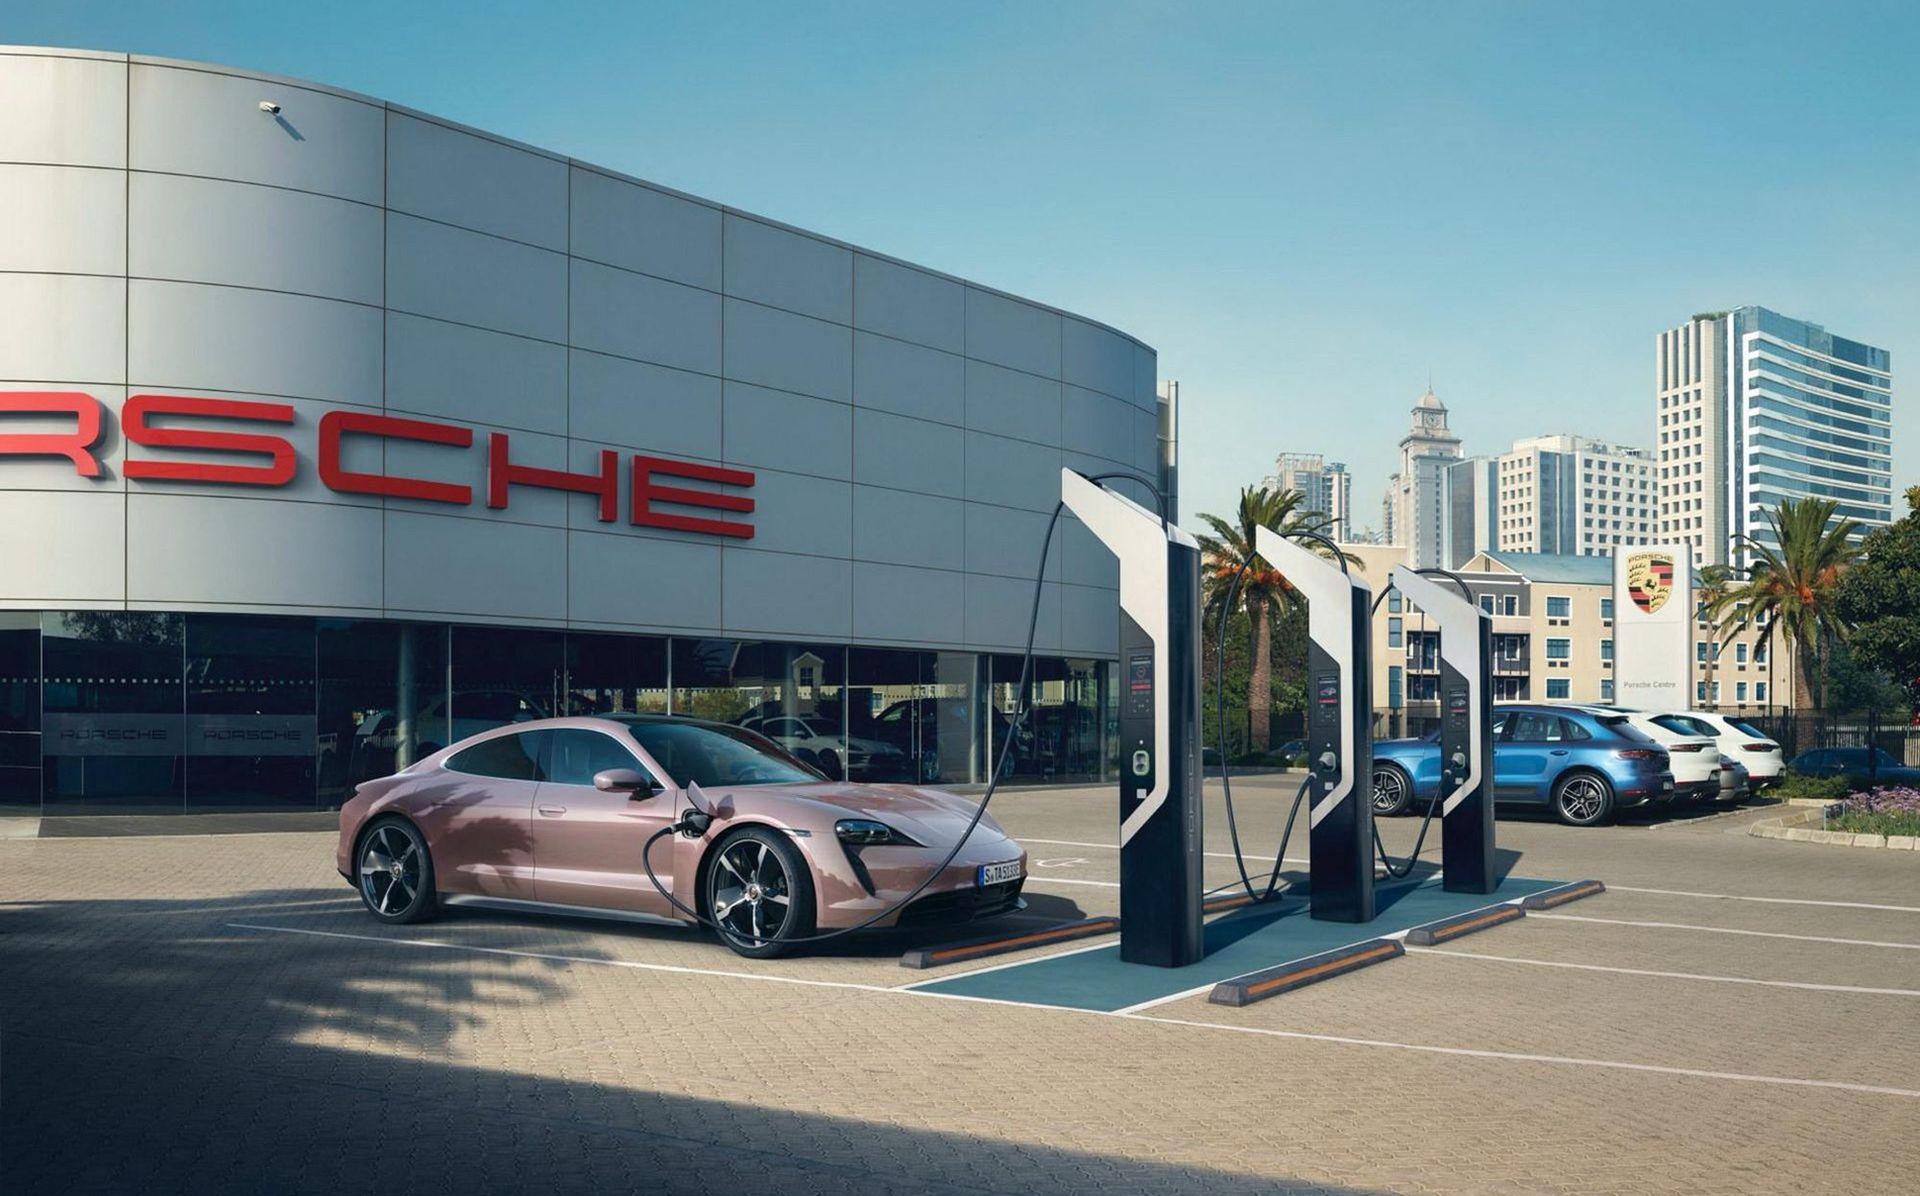 Snik-version av Porsche Taycan presenterad i Kina